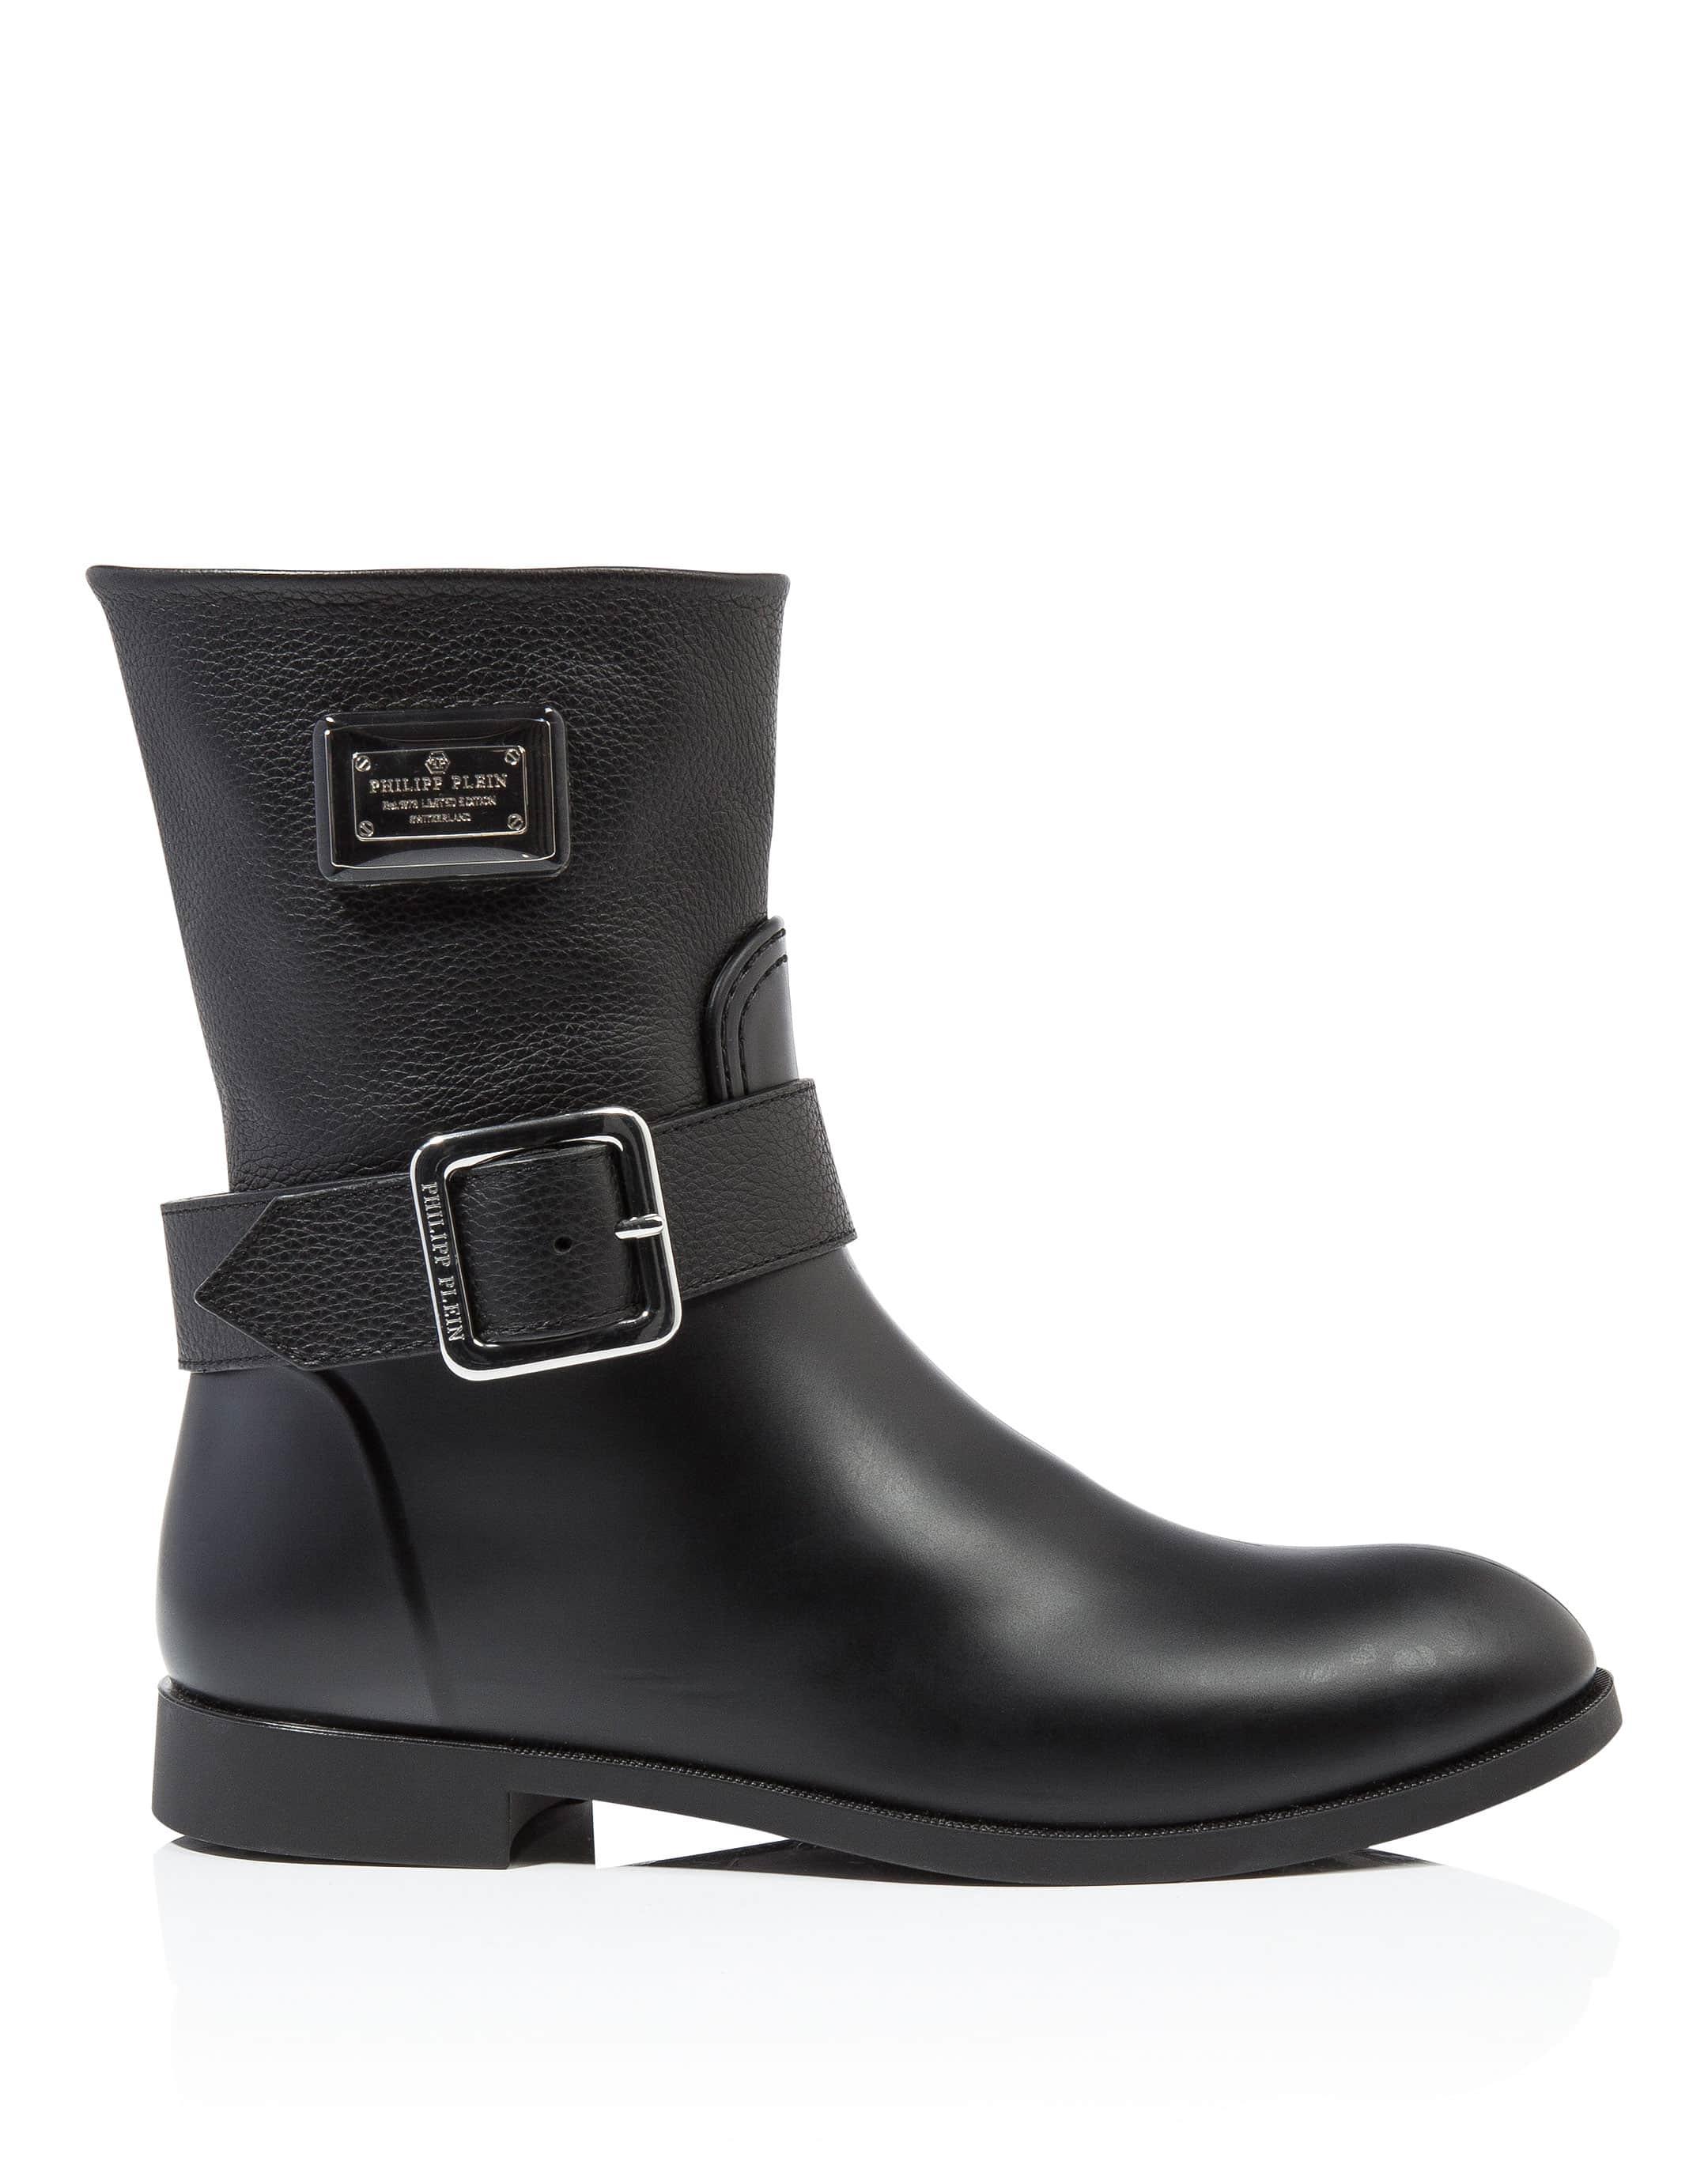 Philipp Plein Gummy flat low boots